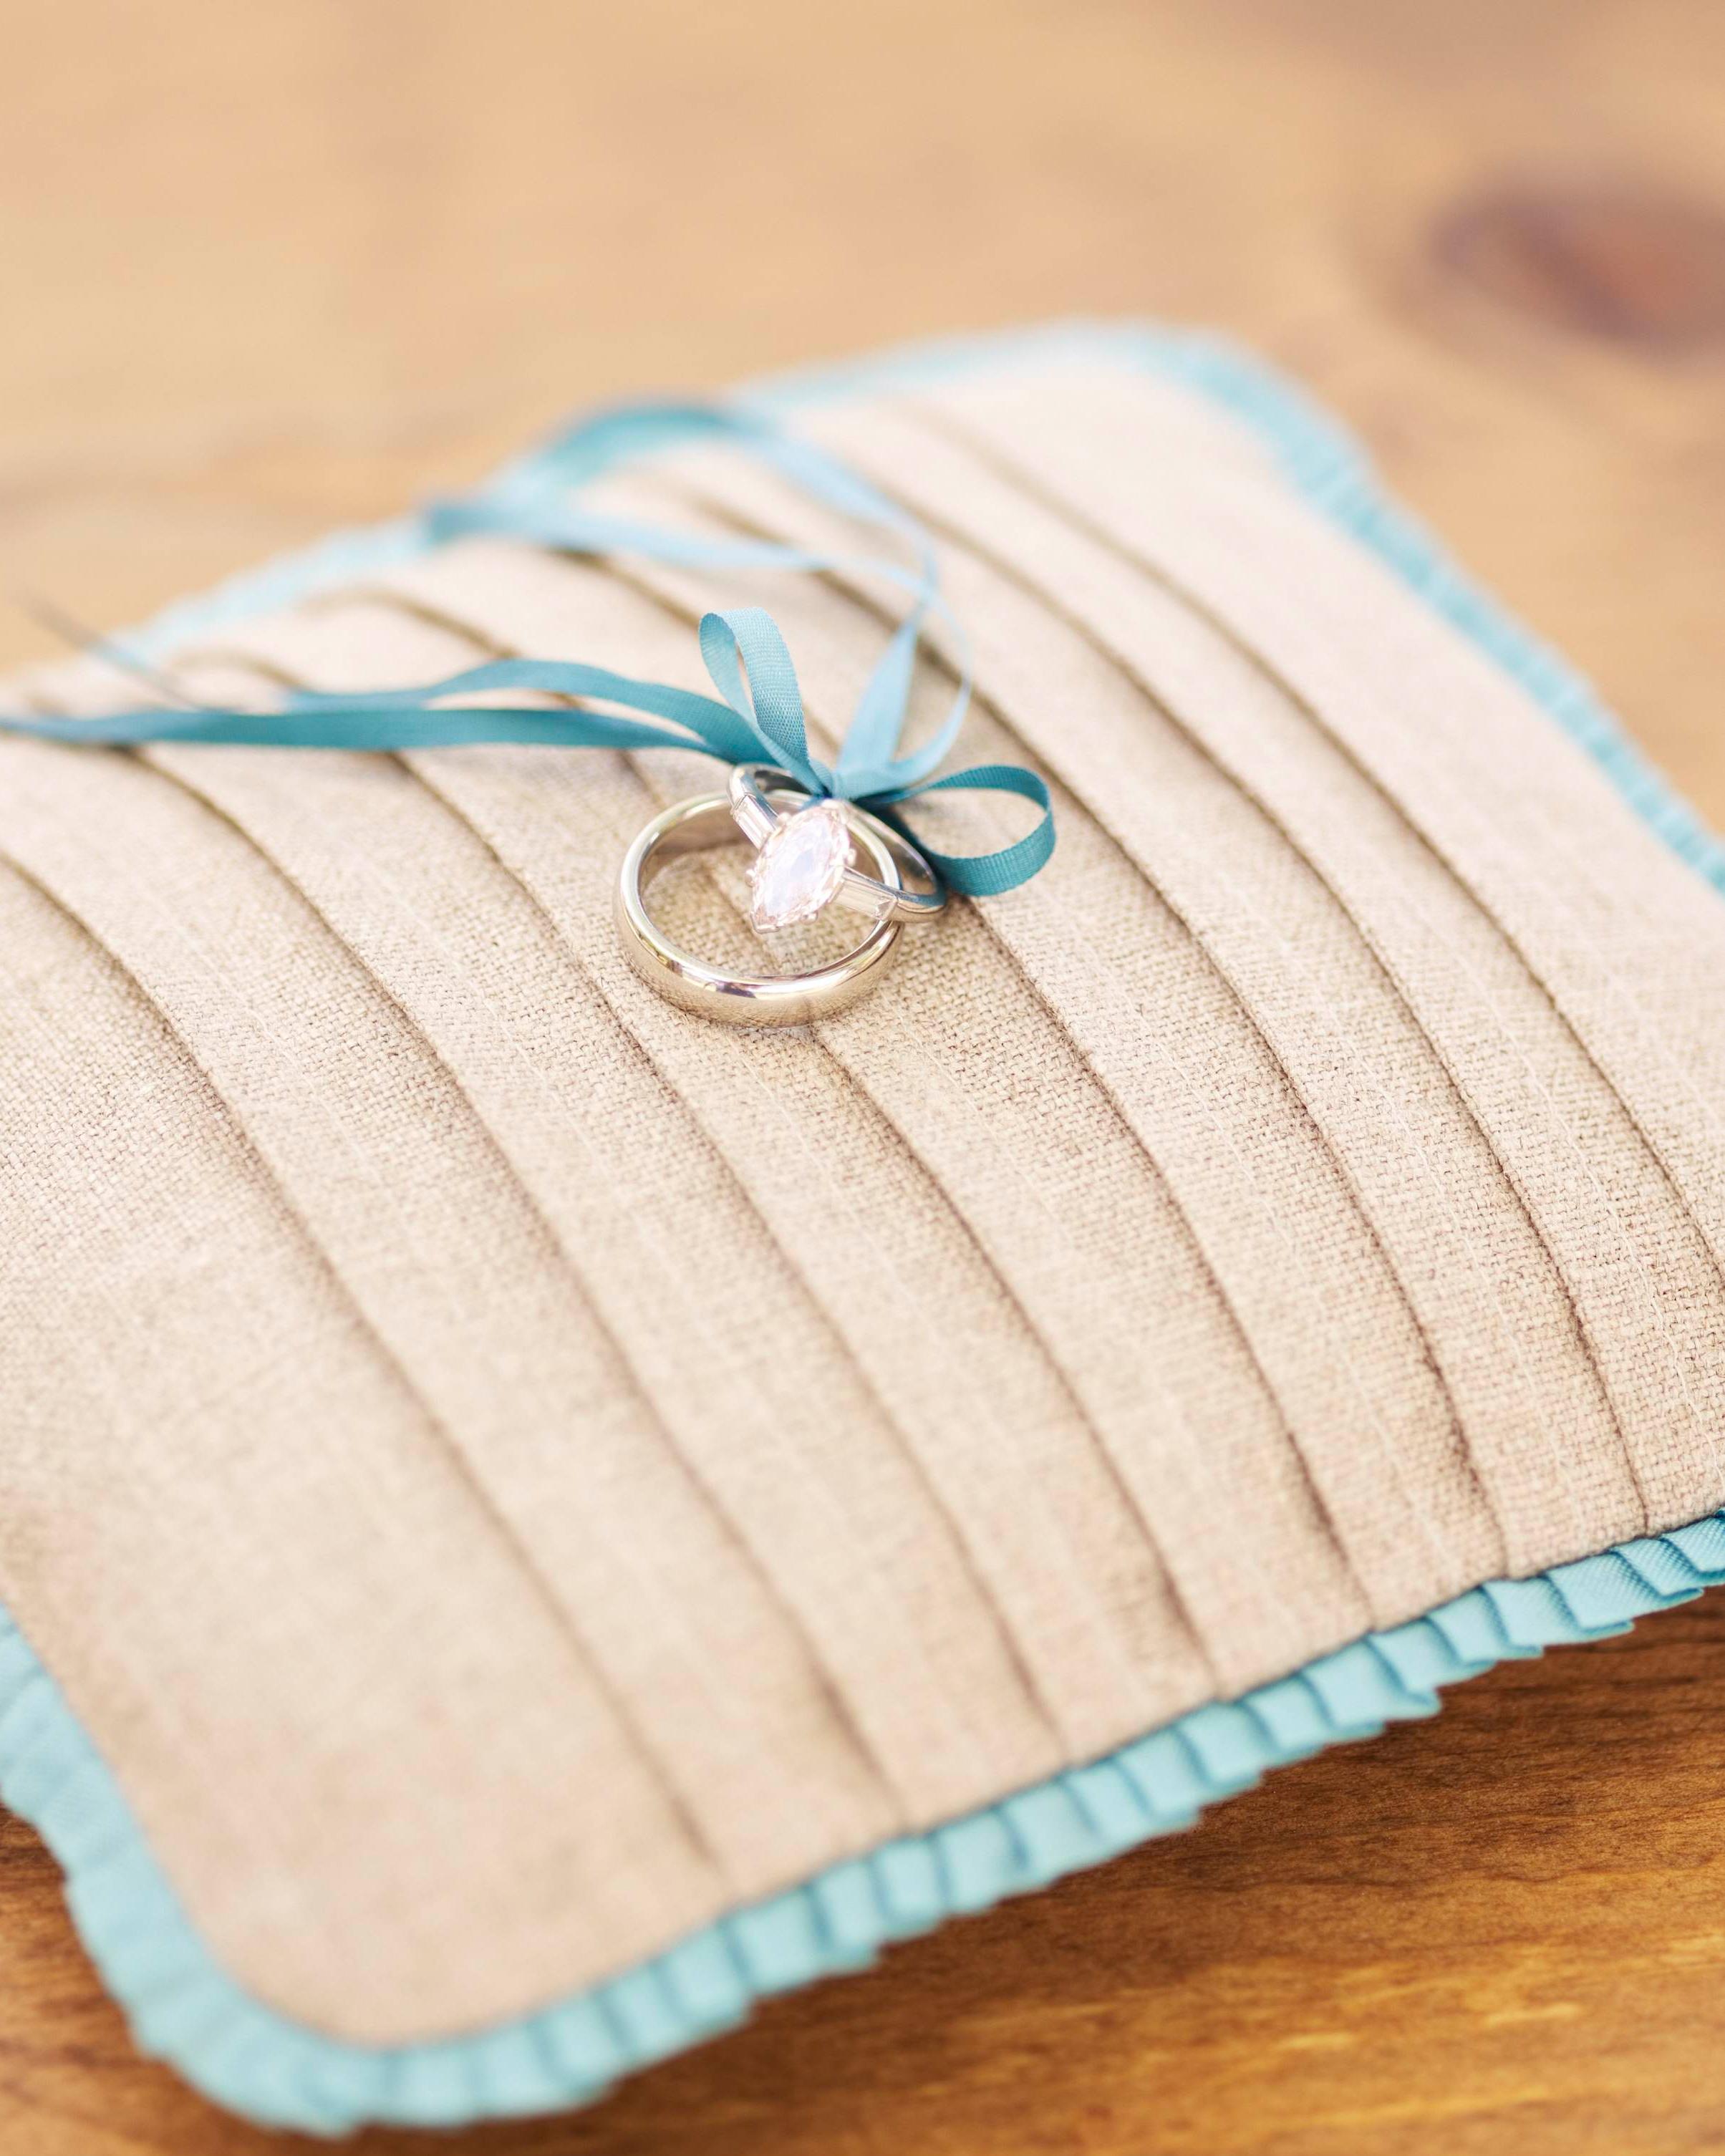 diy-ring-pillows-wd104892-linen-0515.jpg